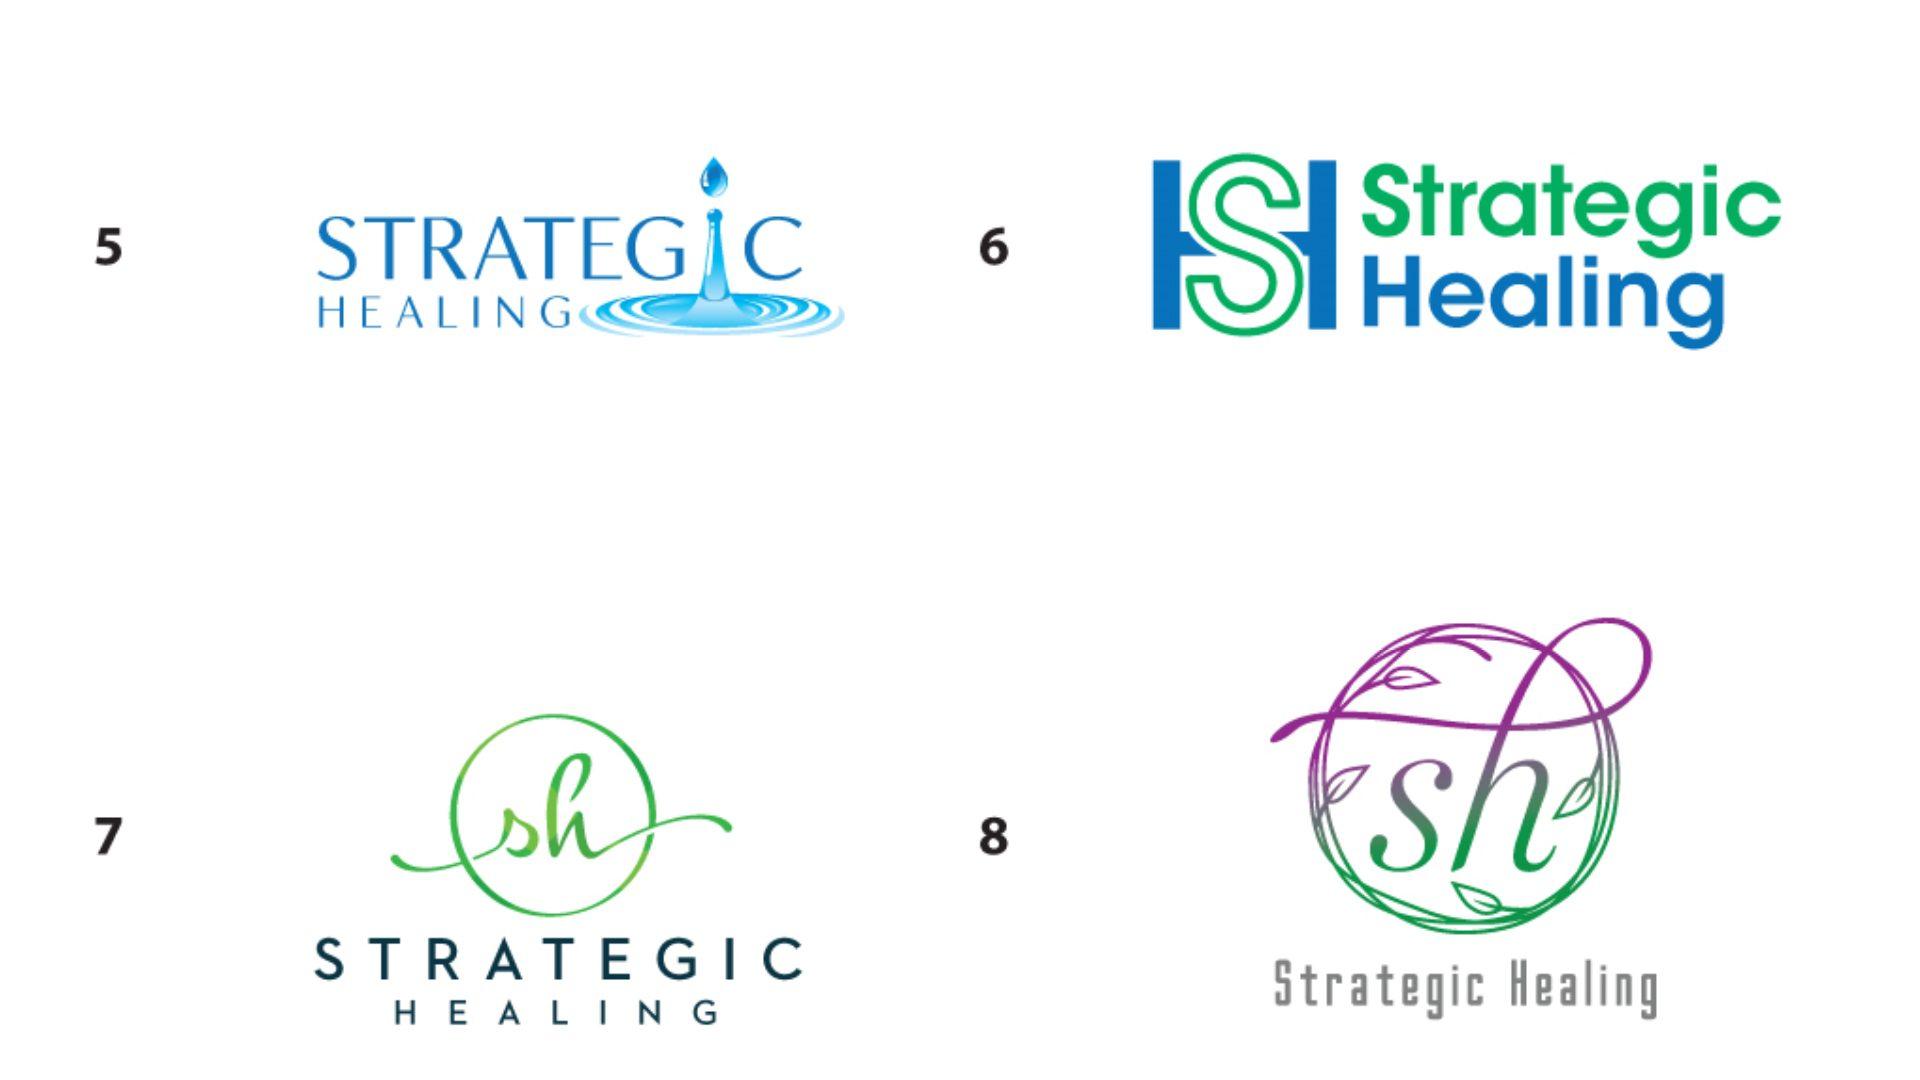 Strategic Healing - Concept 5-8